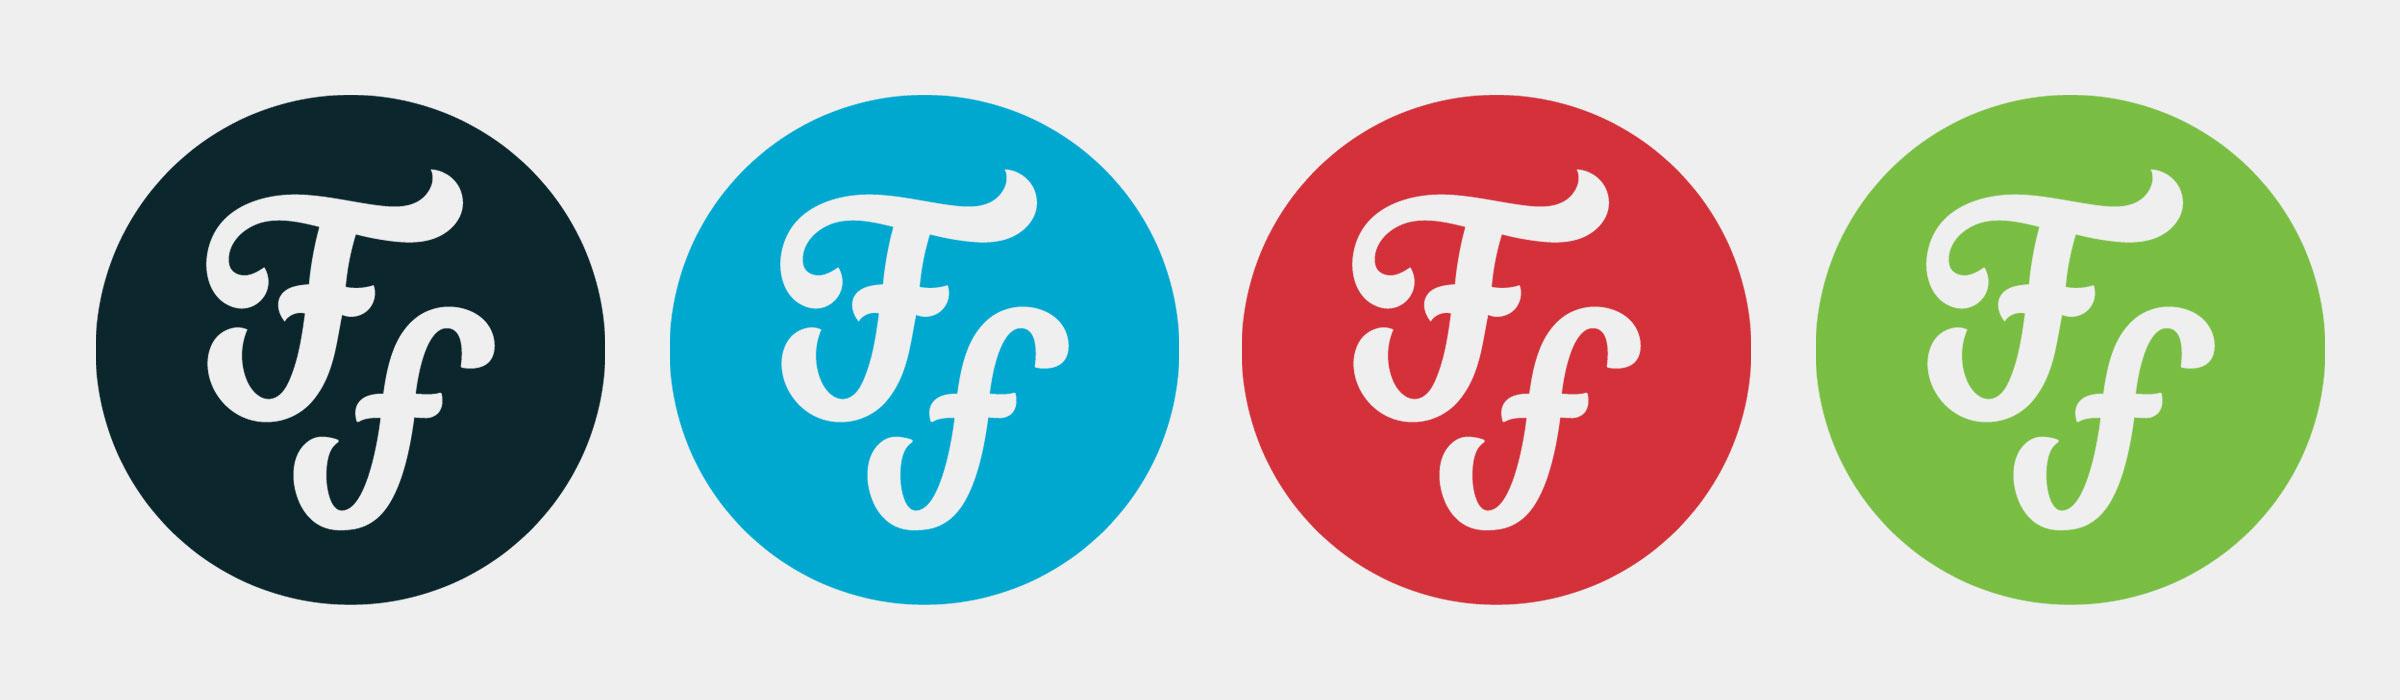 frantz-on-fitness-logo-design-lettering-leo-gomez-studio-06